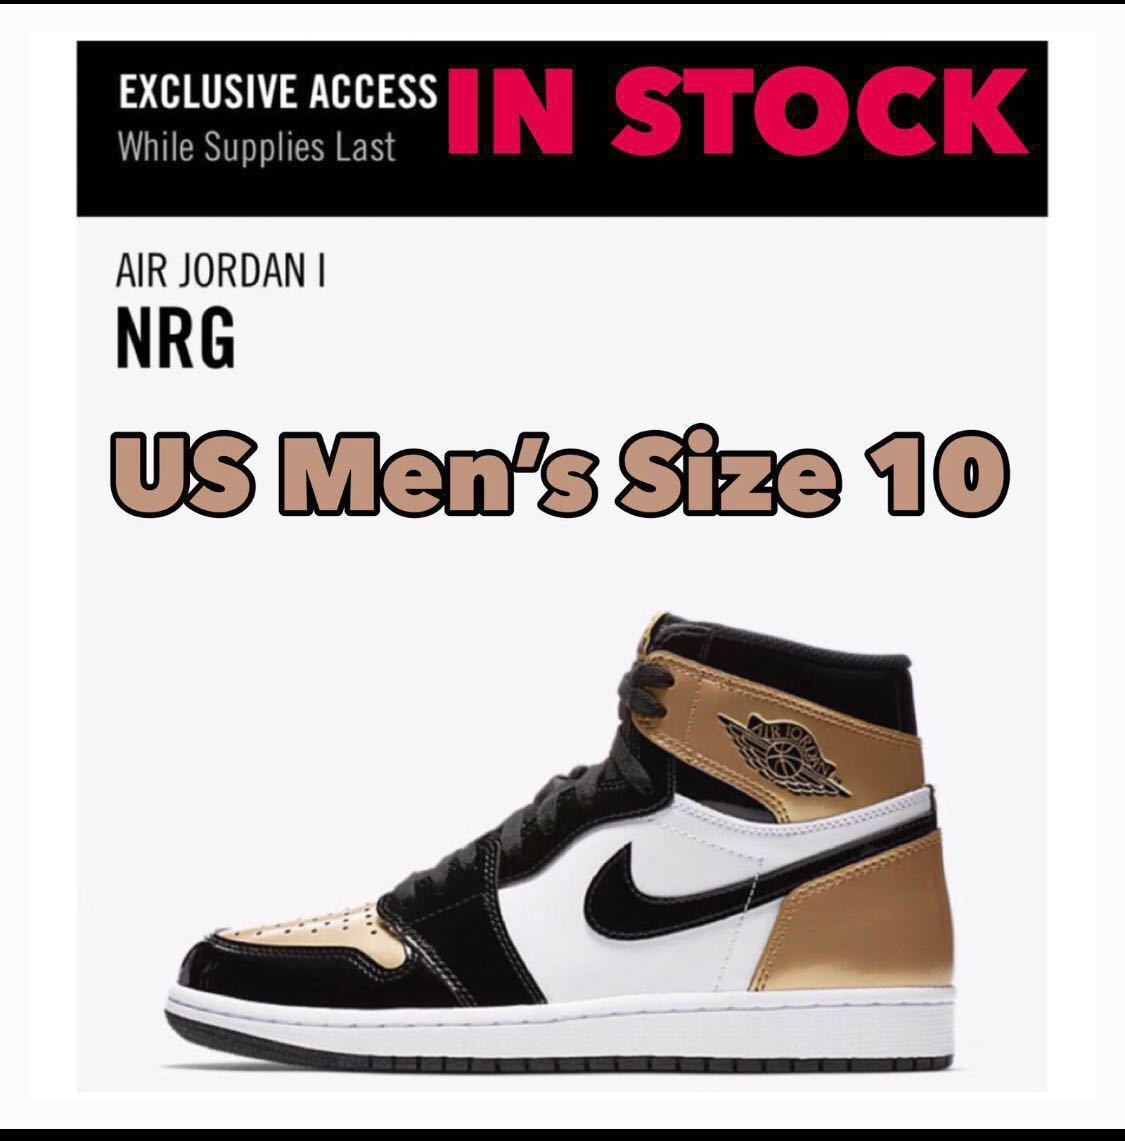 0b81a4505d8 In Stock Men's Nike Air Jordan 1 RETRO HIGH NRG PATENT GOLD TOE ...